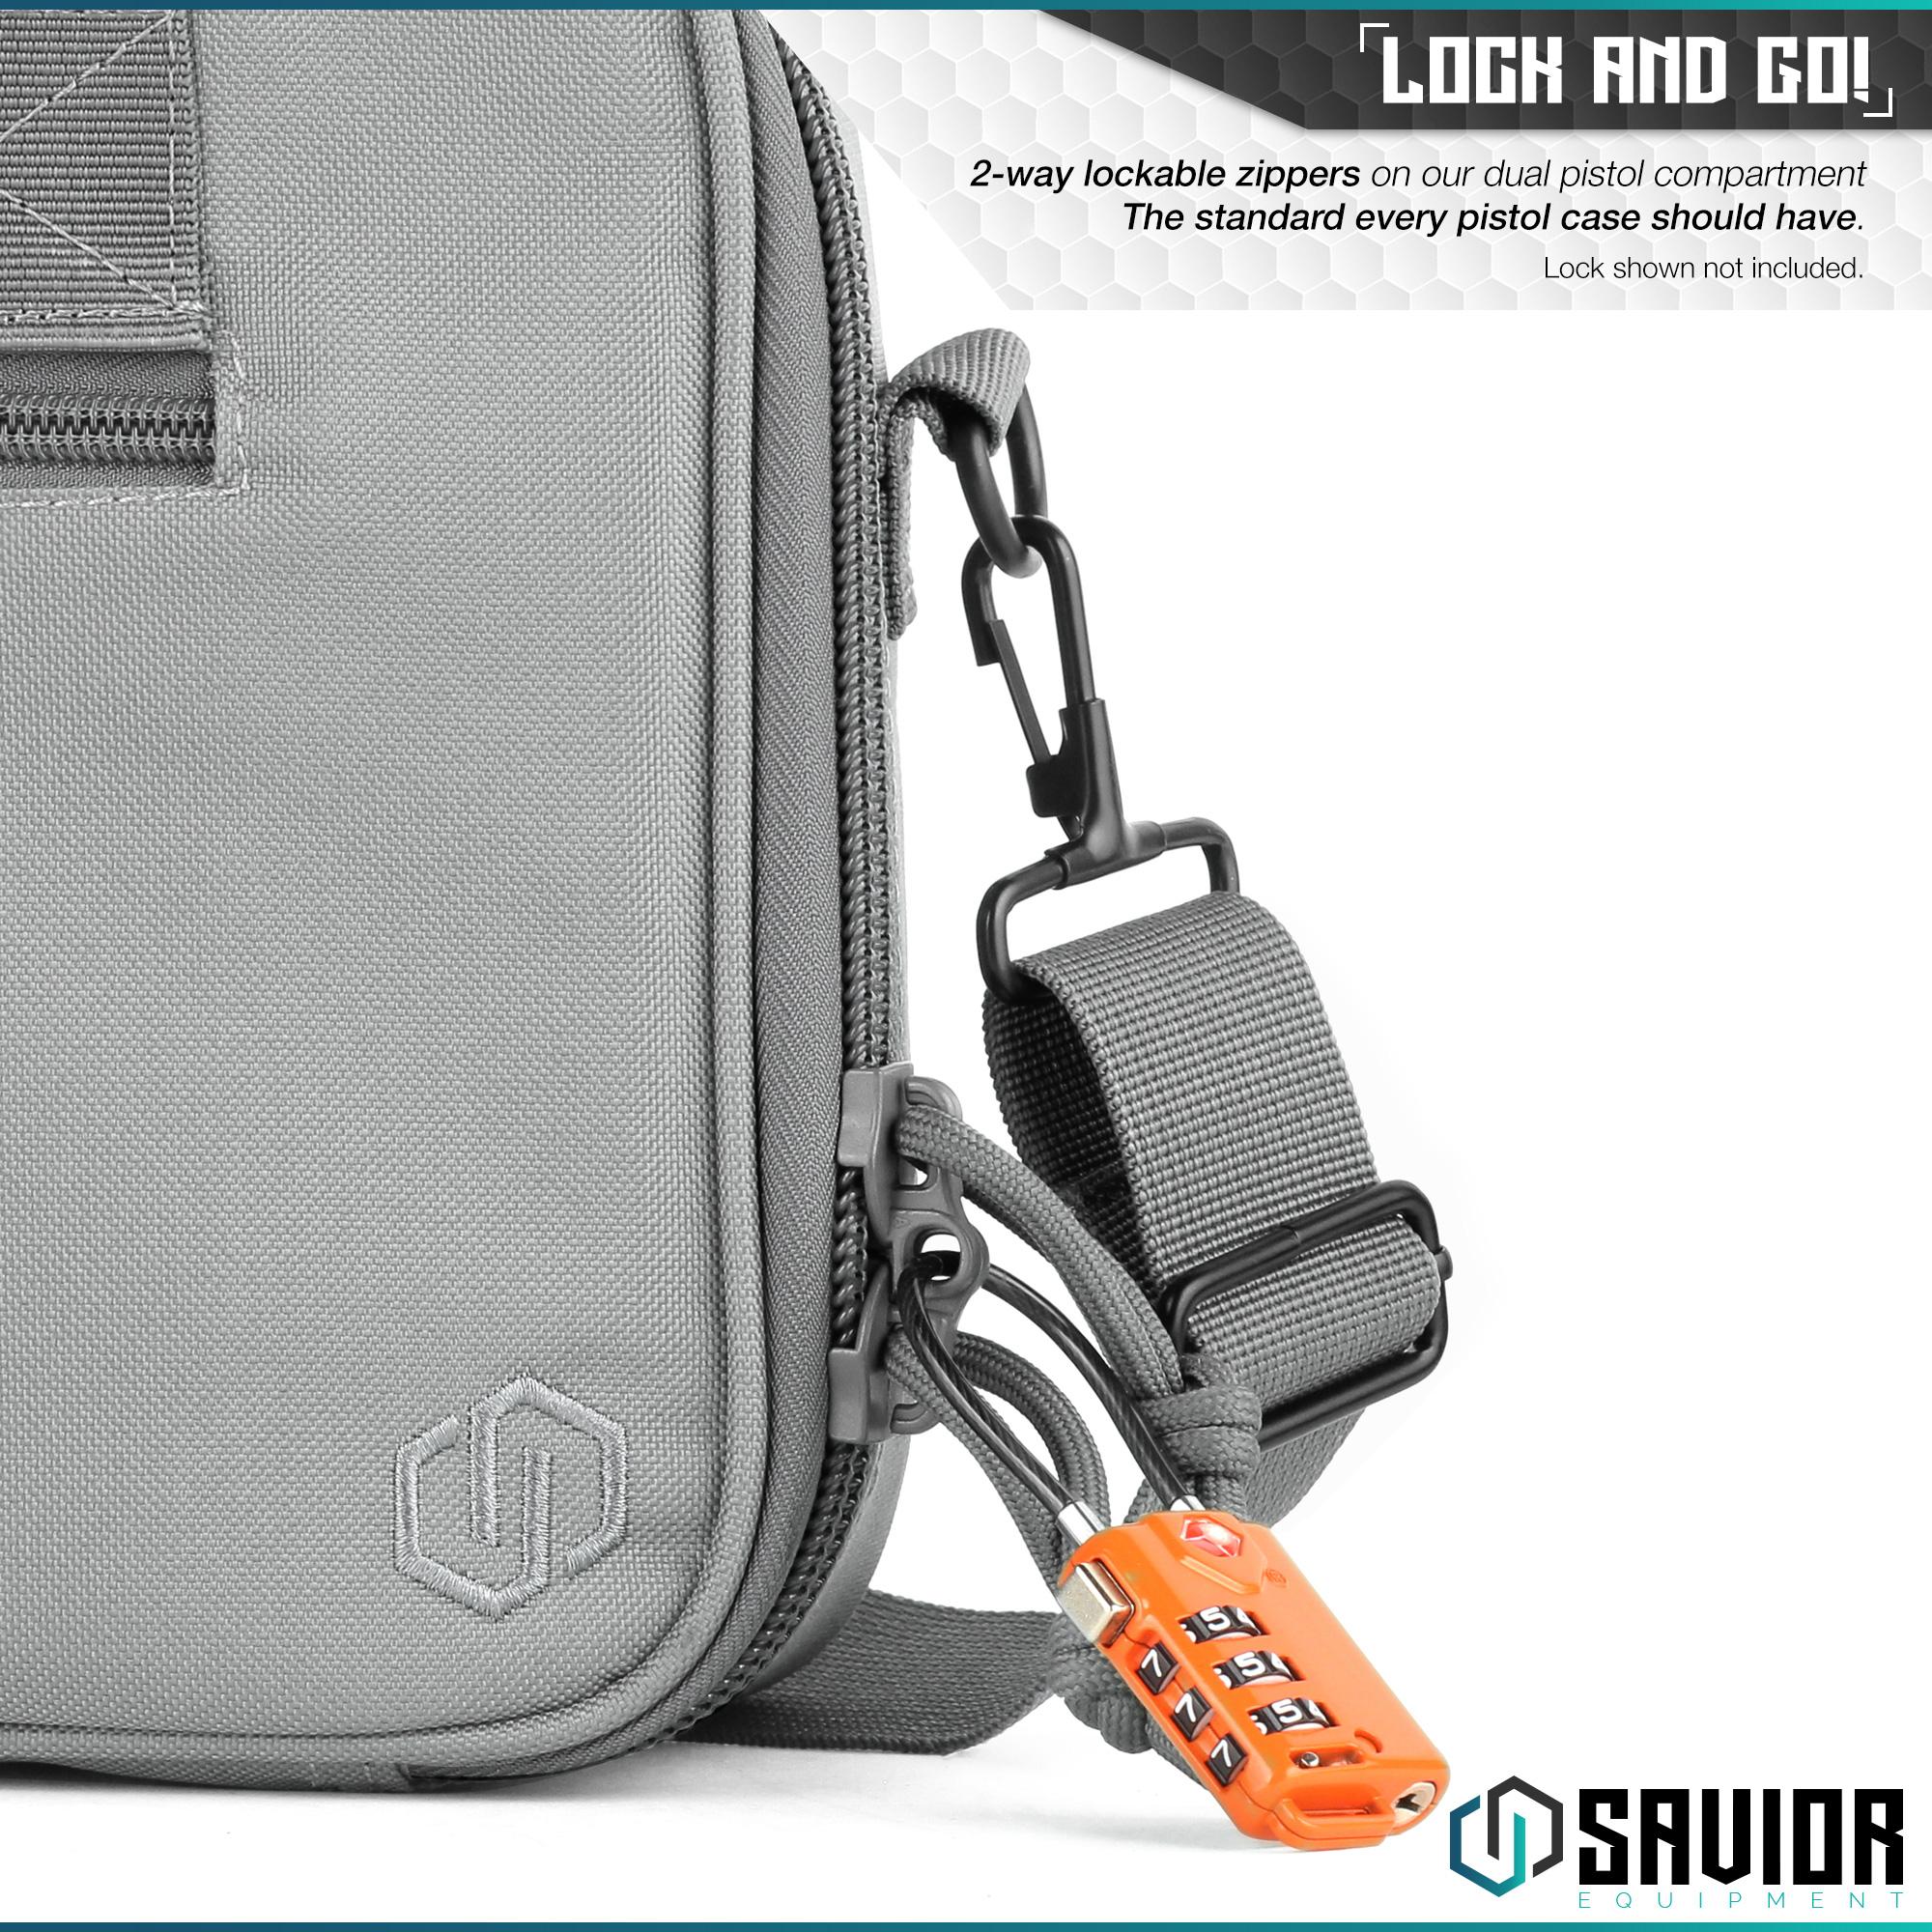 034-SAVIOR-034-Padded-Discreet-Double-Handgun-Bag-Pistol-Storage-Case-w-Mag-Pouch-Slot thumbnail 5